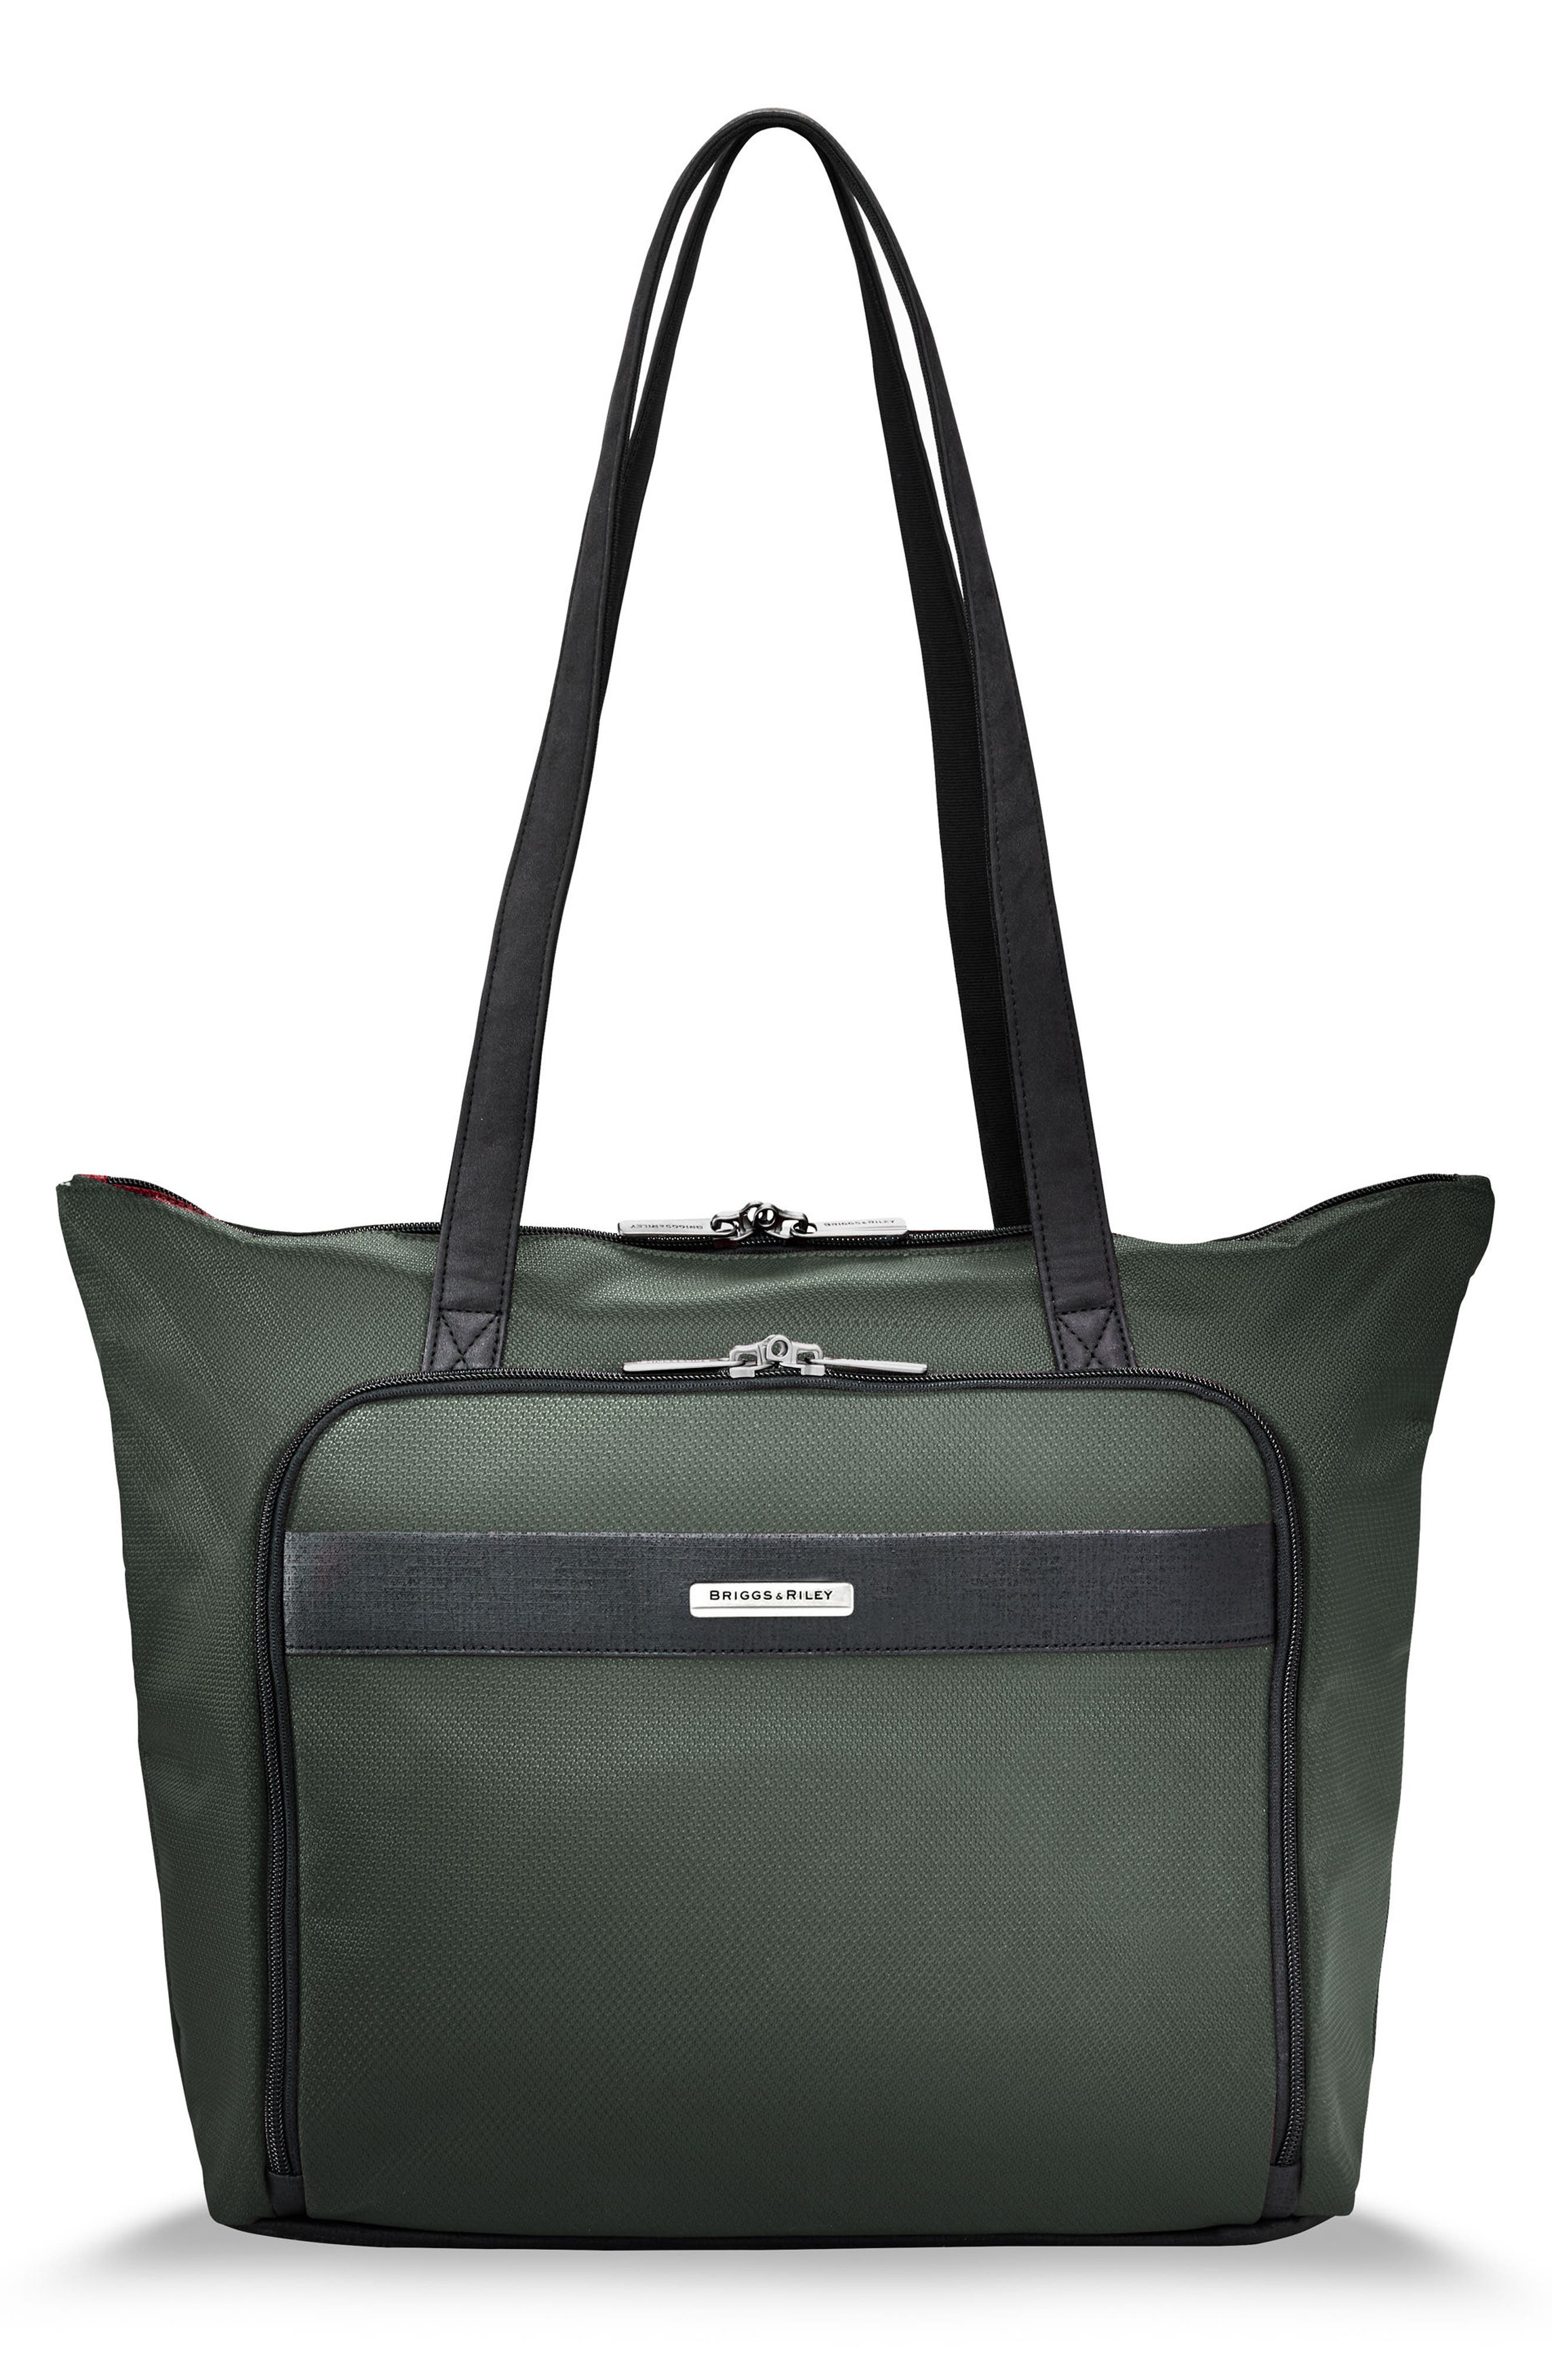 Transcend 400 Tote Bag,                         Main,                         color, RAINFOREST GREEN